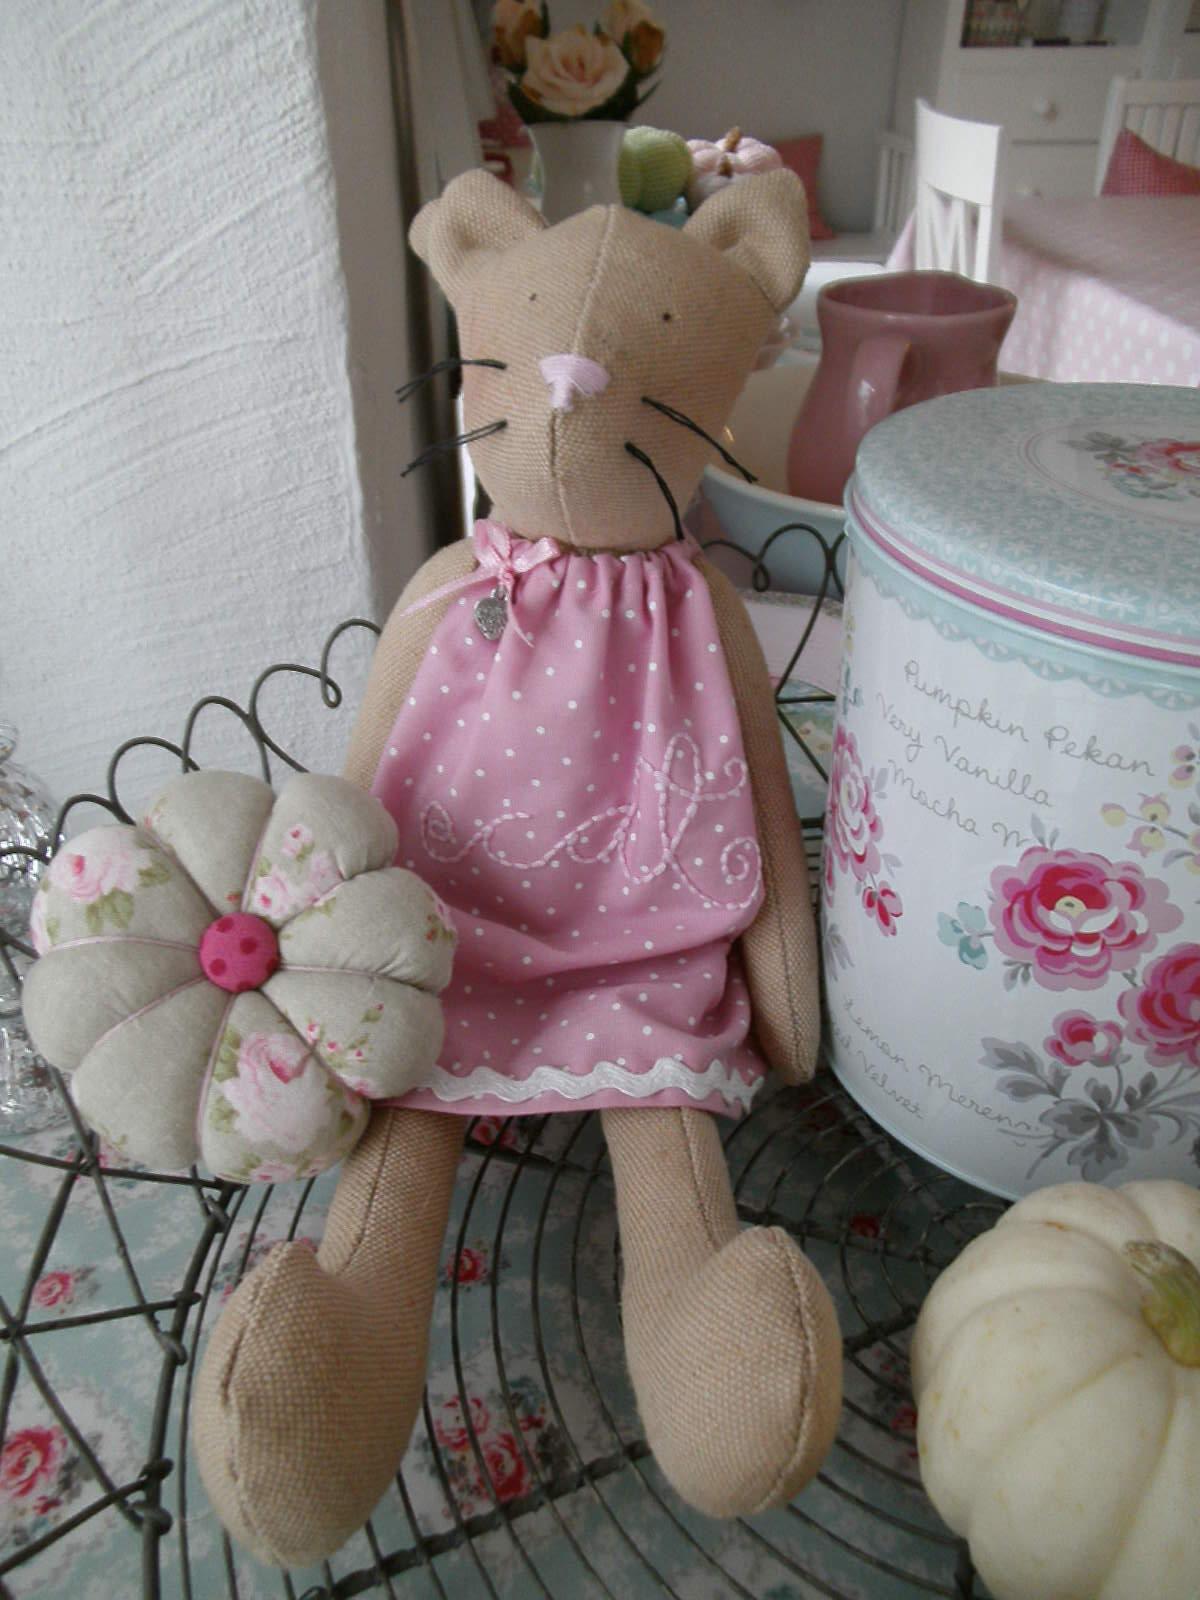 lila lavendel gen ht geschenkt getauscht. Black Bedroom Furniture Sets. Home Design Ideas